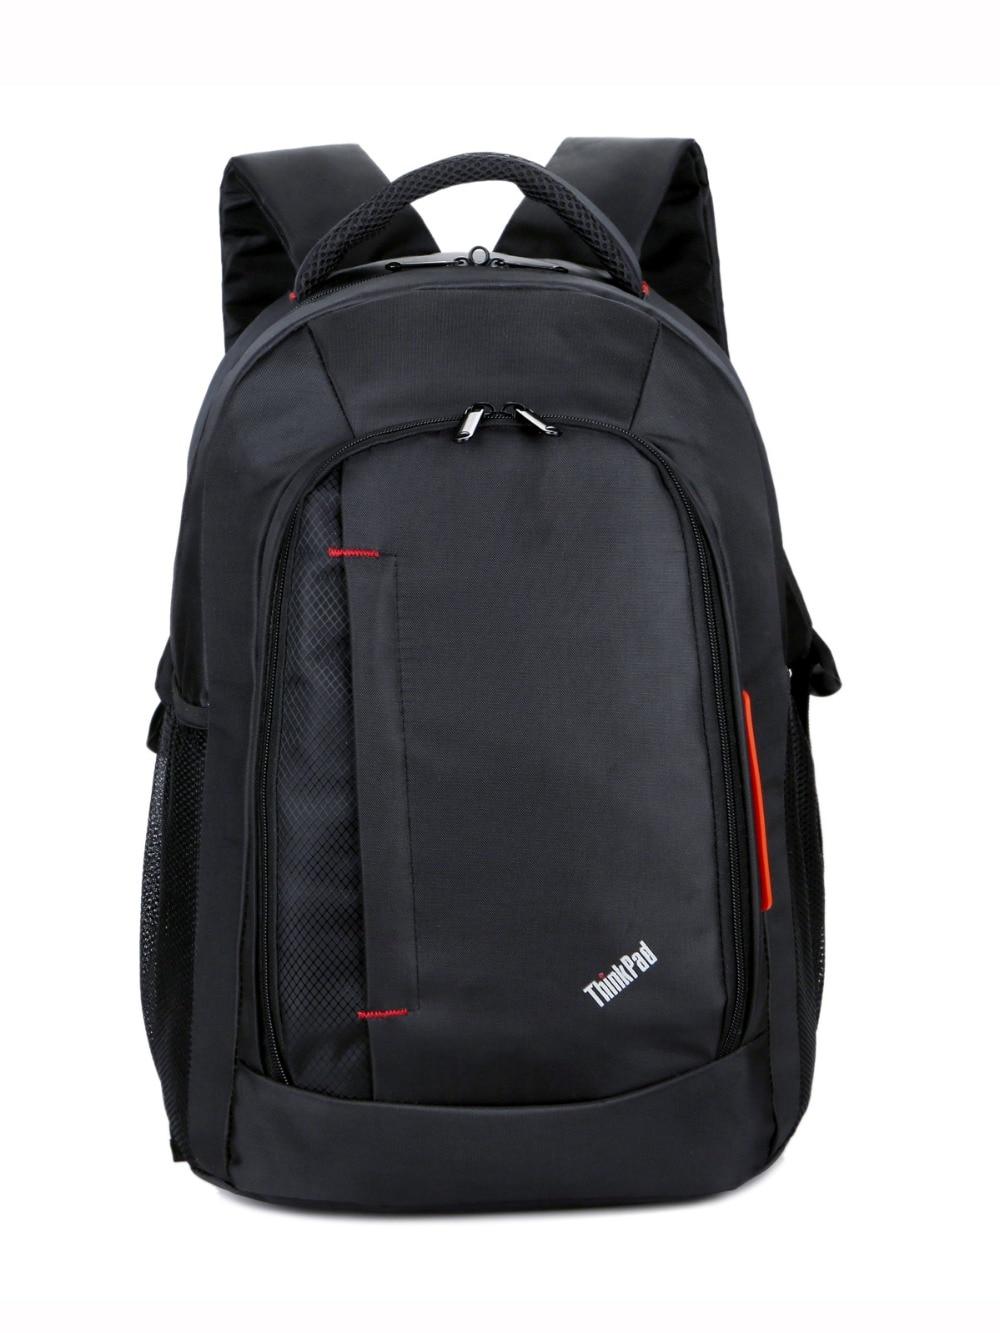 Original Lenovo ThinkPad Laptop Bag 15.6 inch Business Backpack Double Shoulder Men Women BP100 0A33911